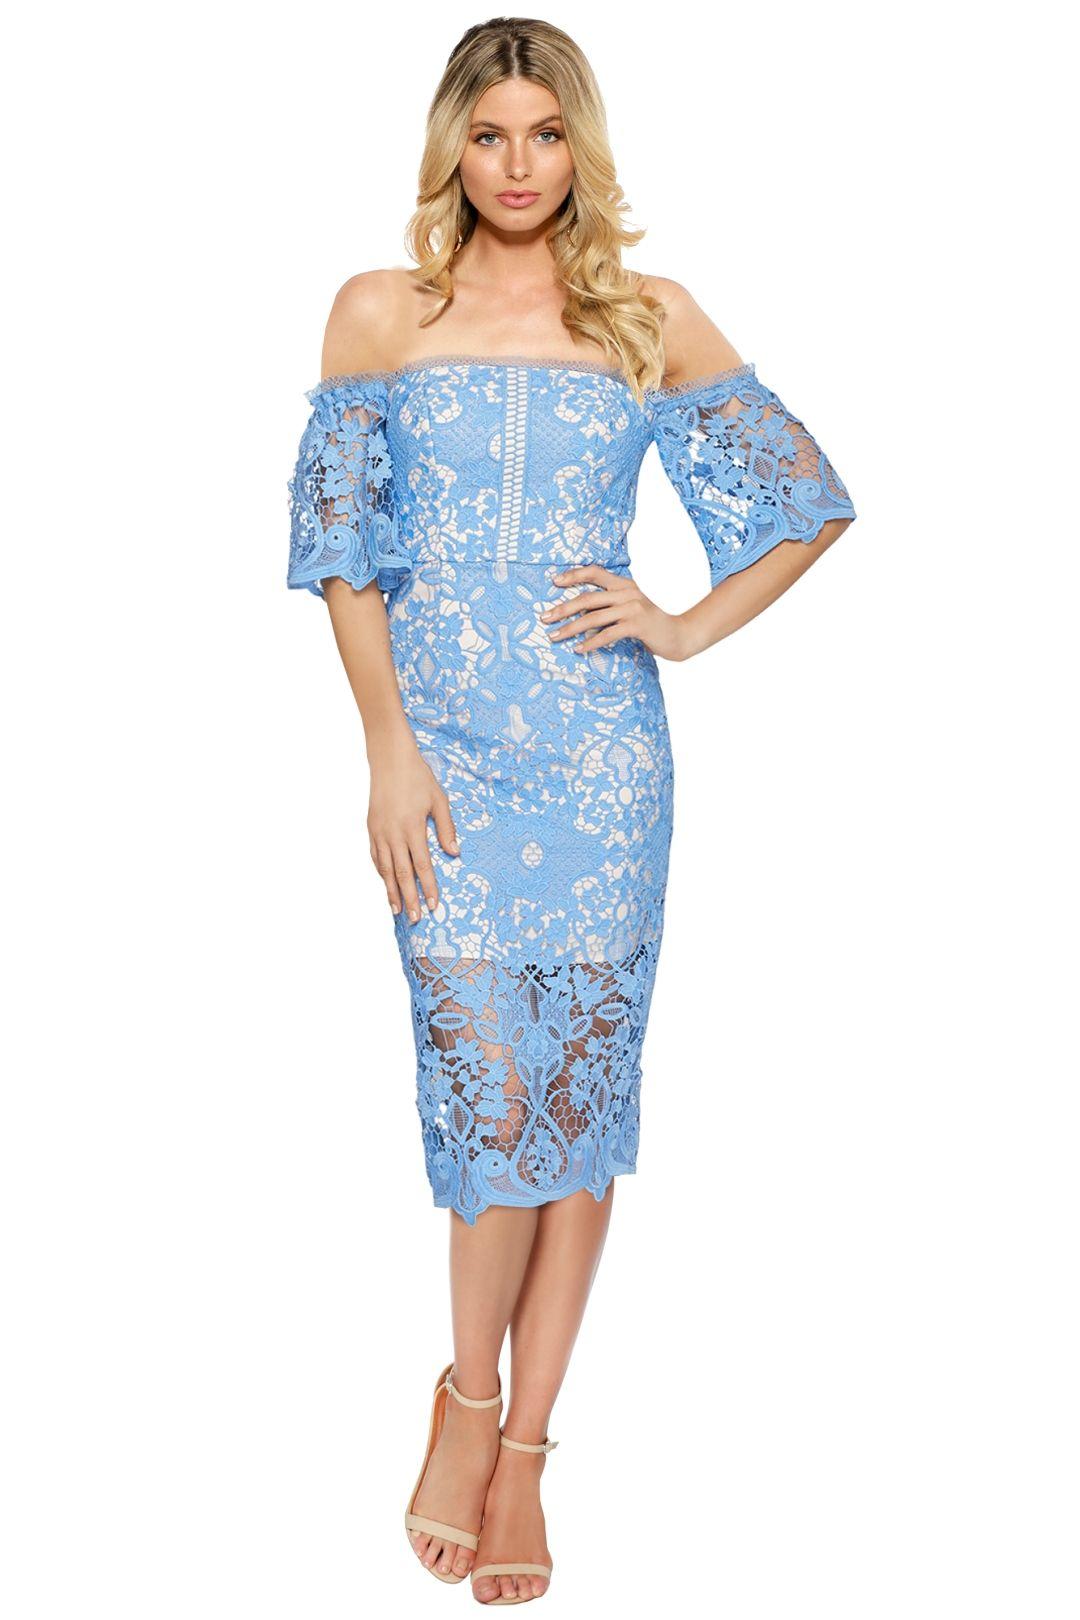 Rodeo Show - Odette Lace Dress - Blue - Front